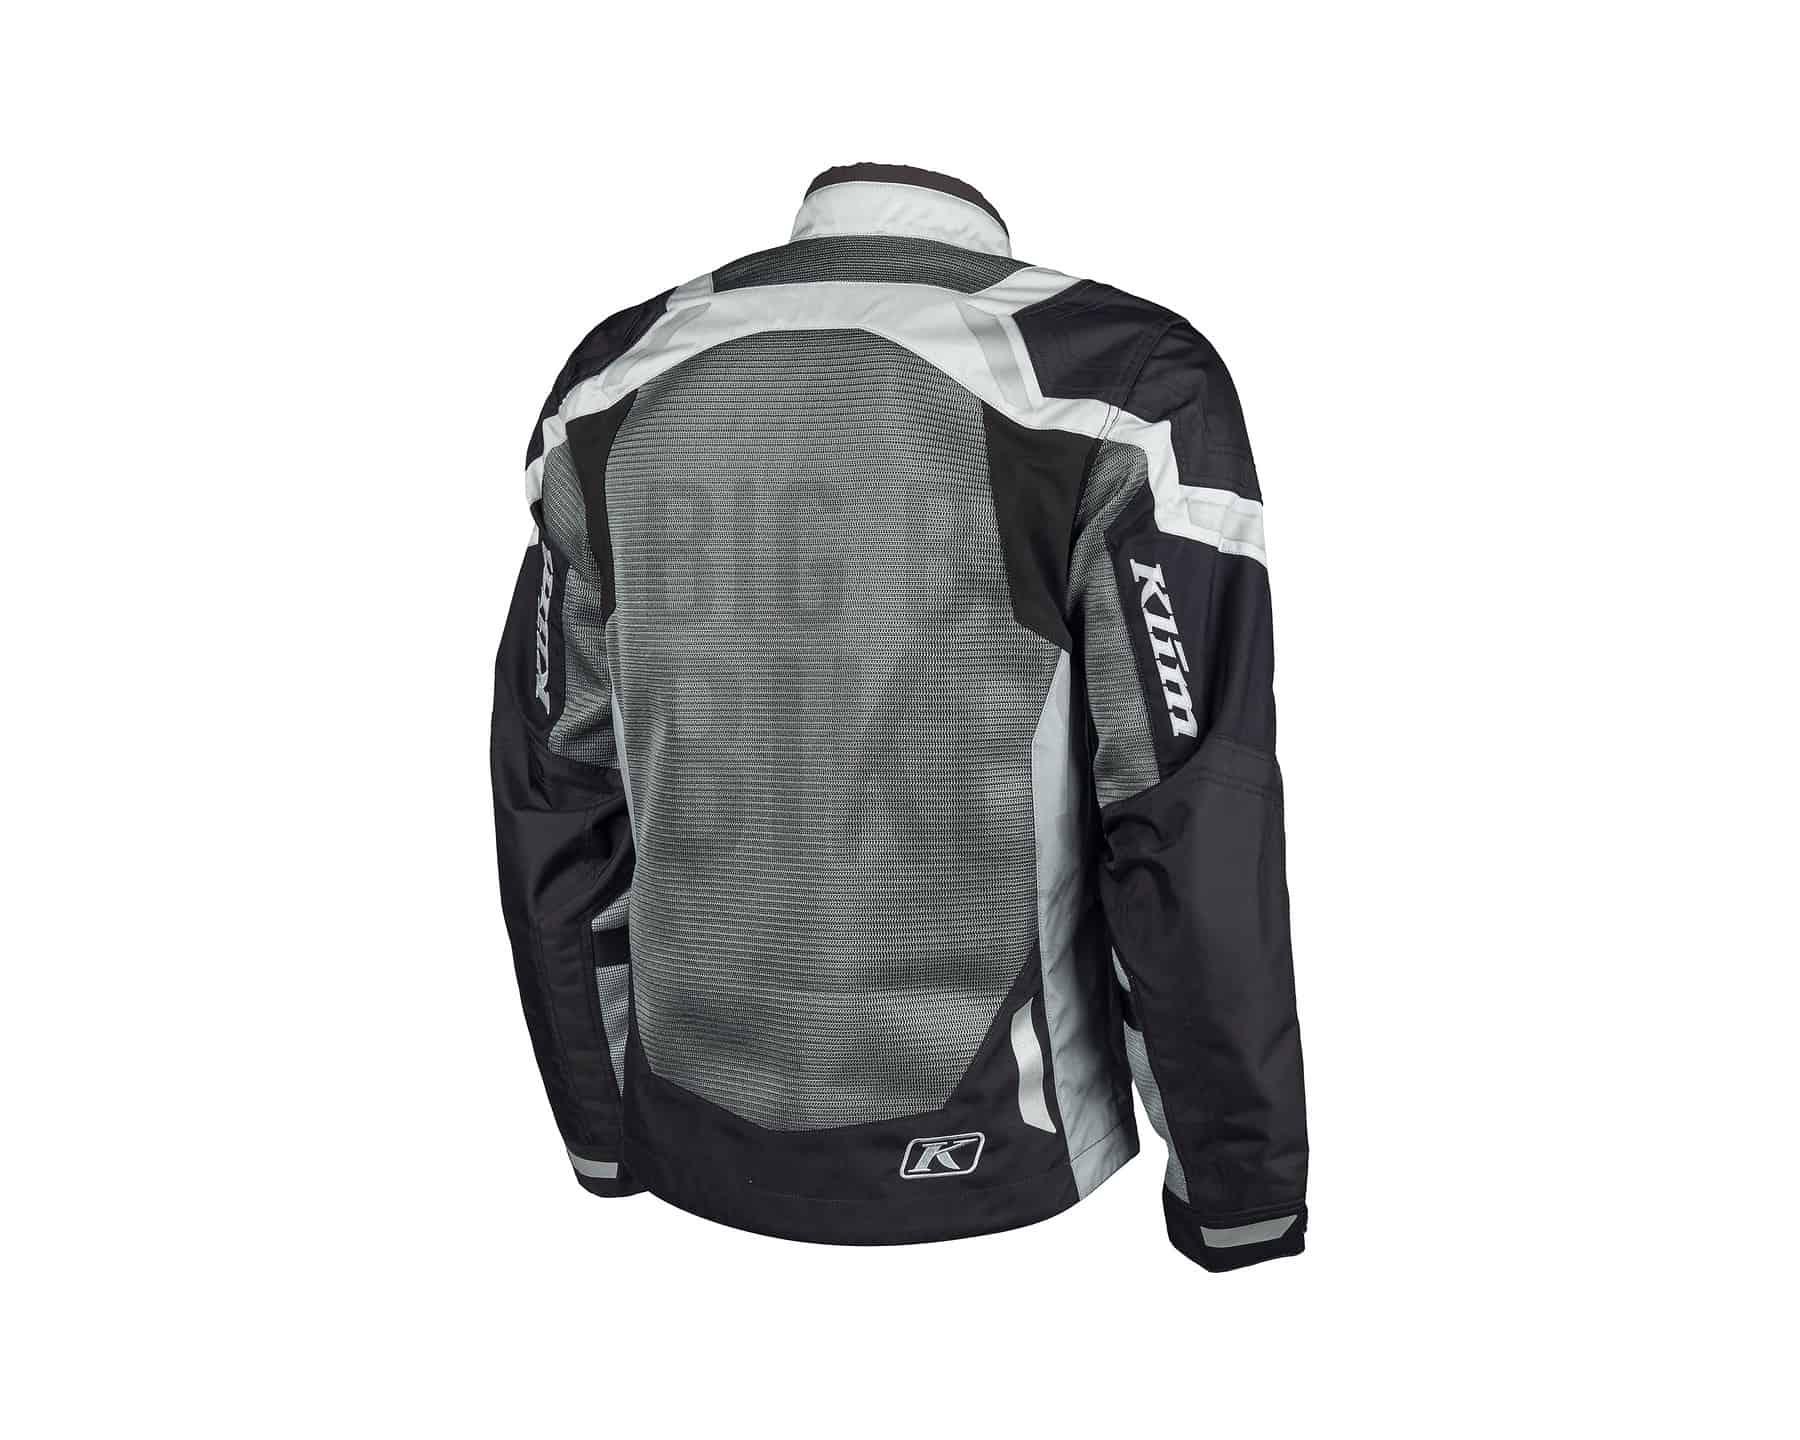 Induction Jacket_5060-002_Light Gray_06